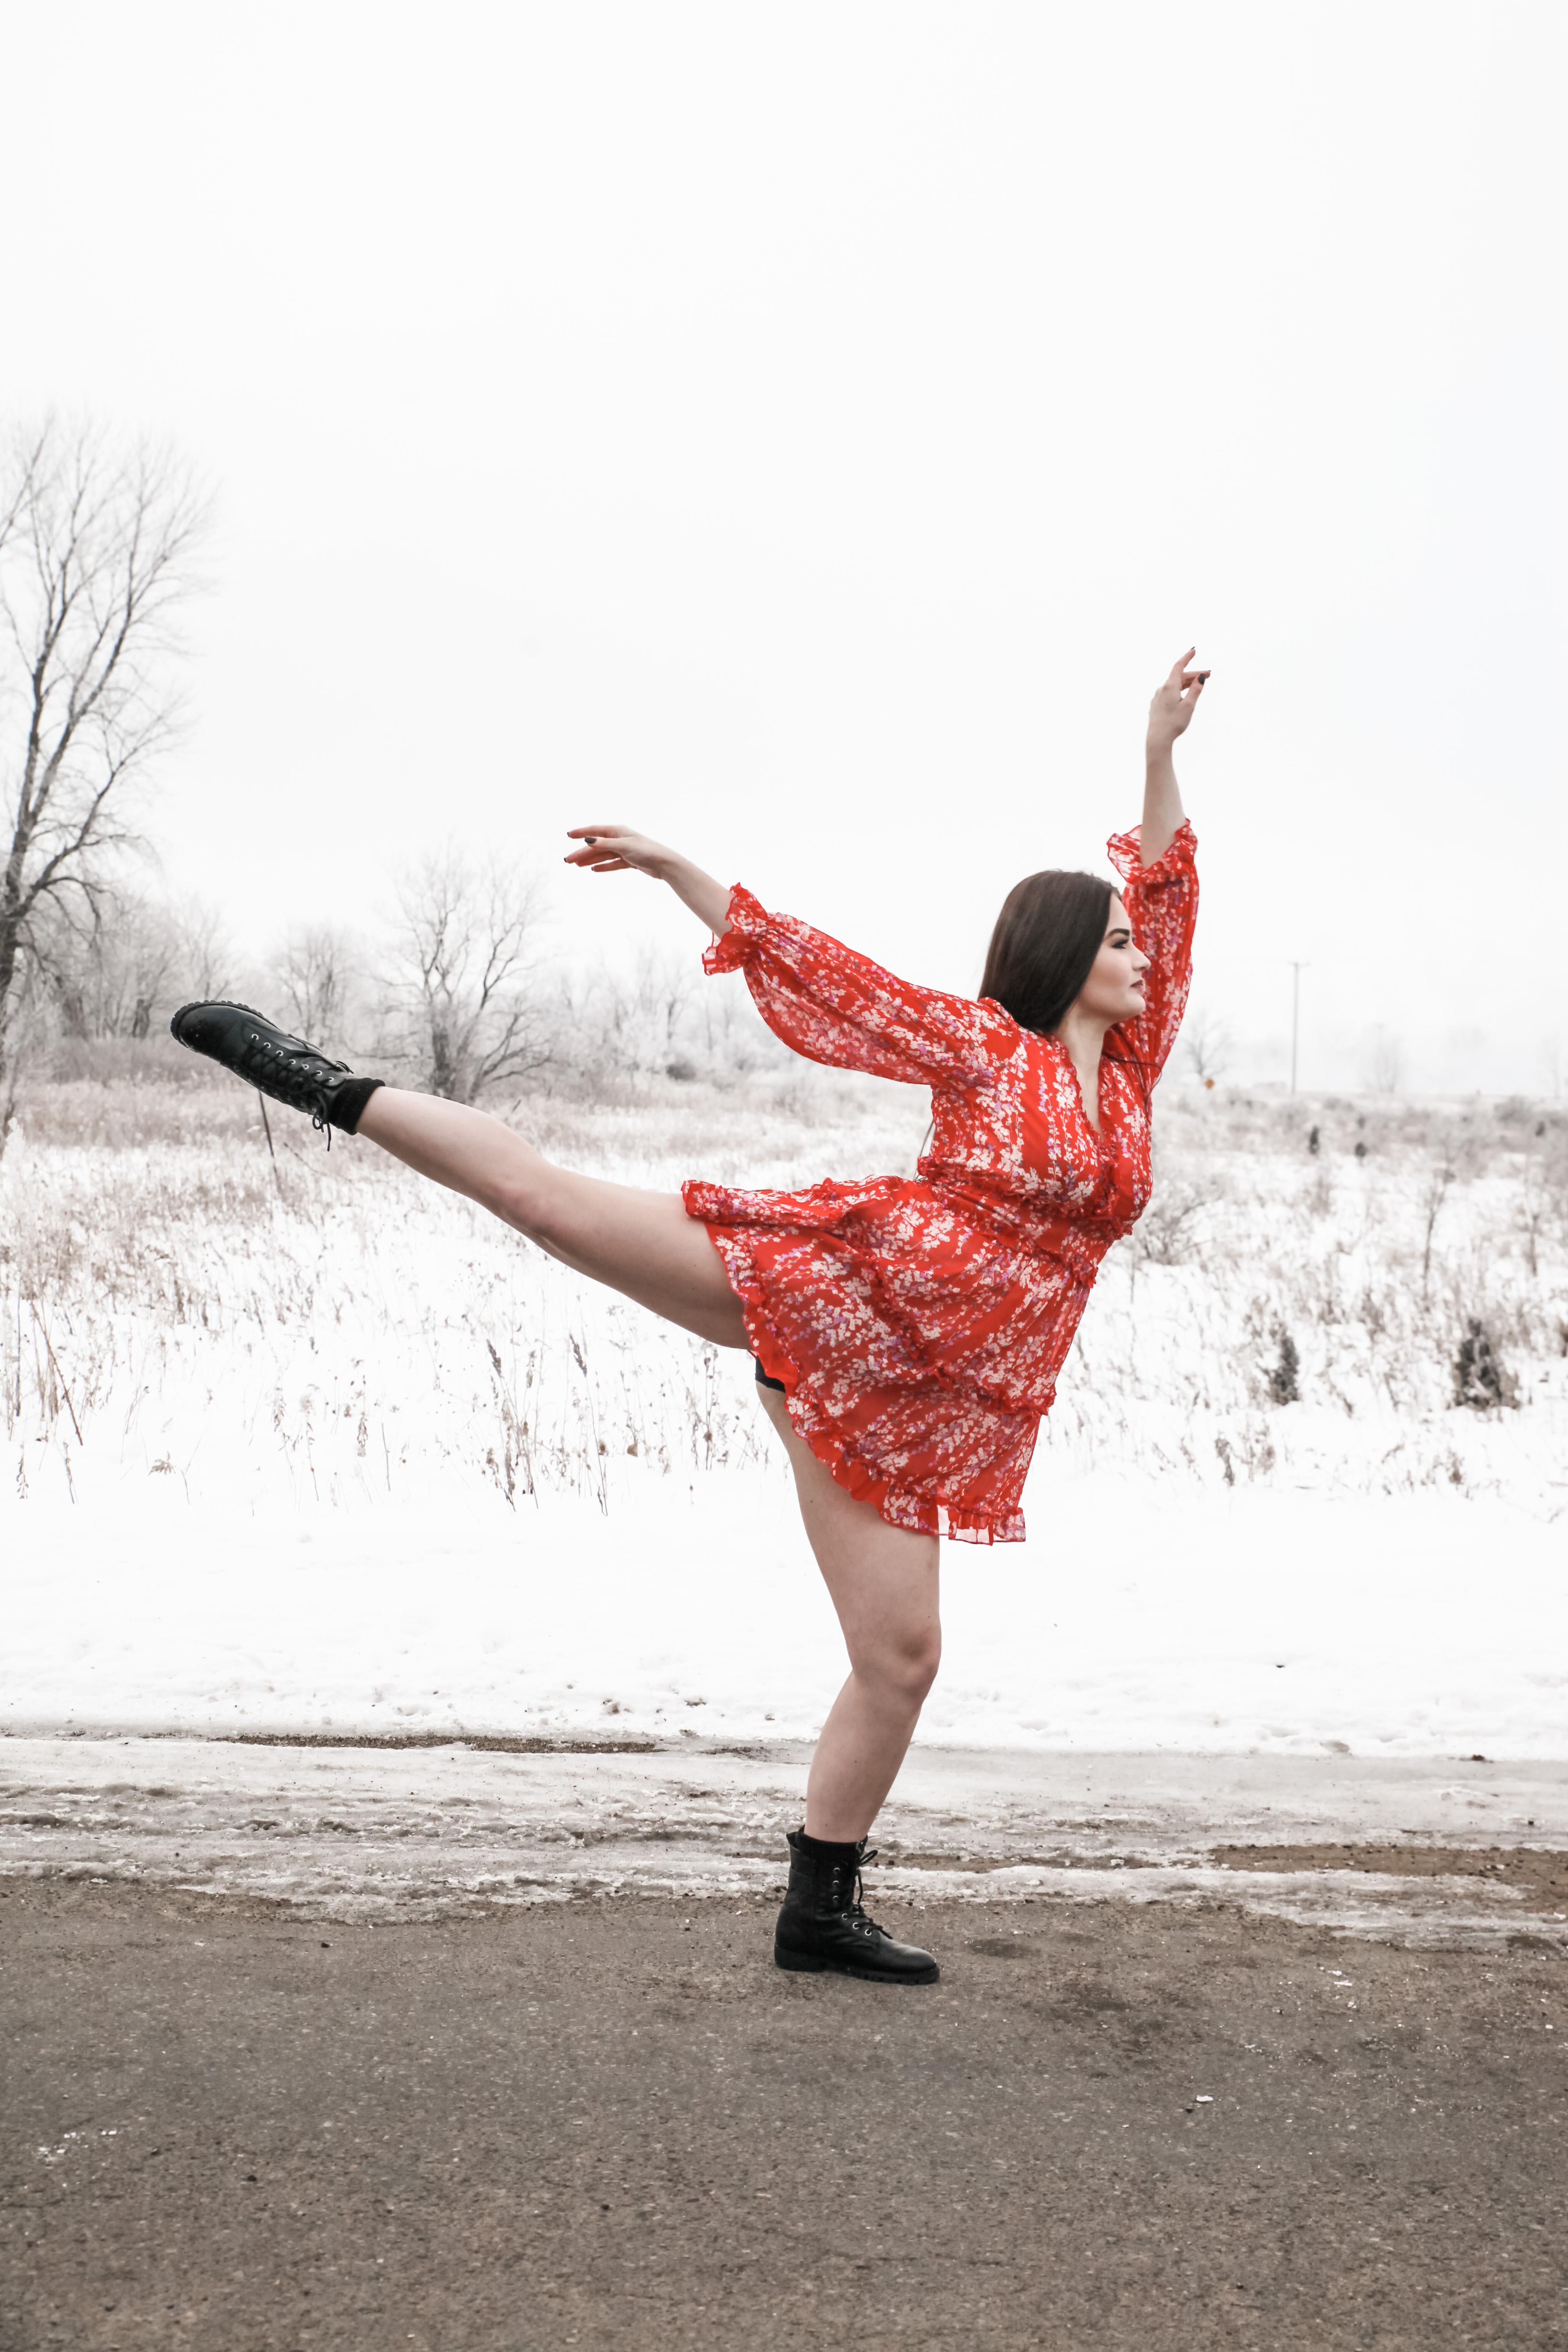 Senior Dance Photo Adventure